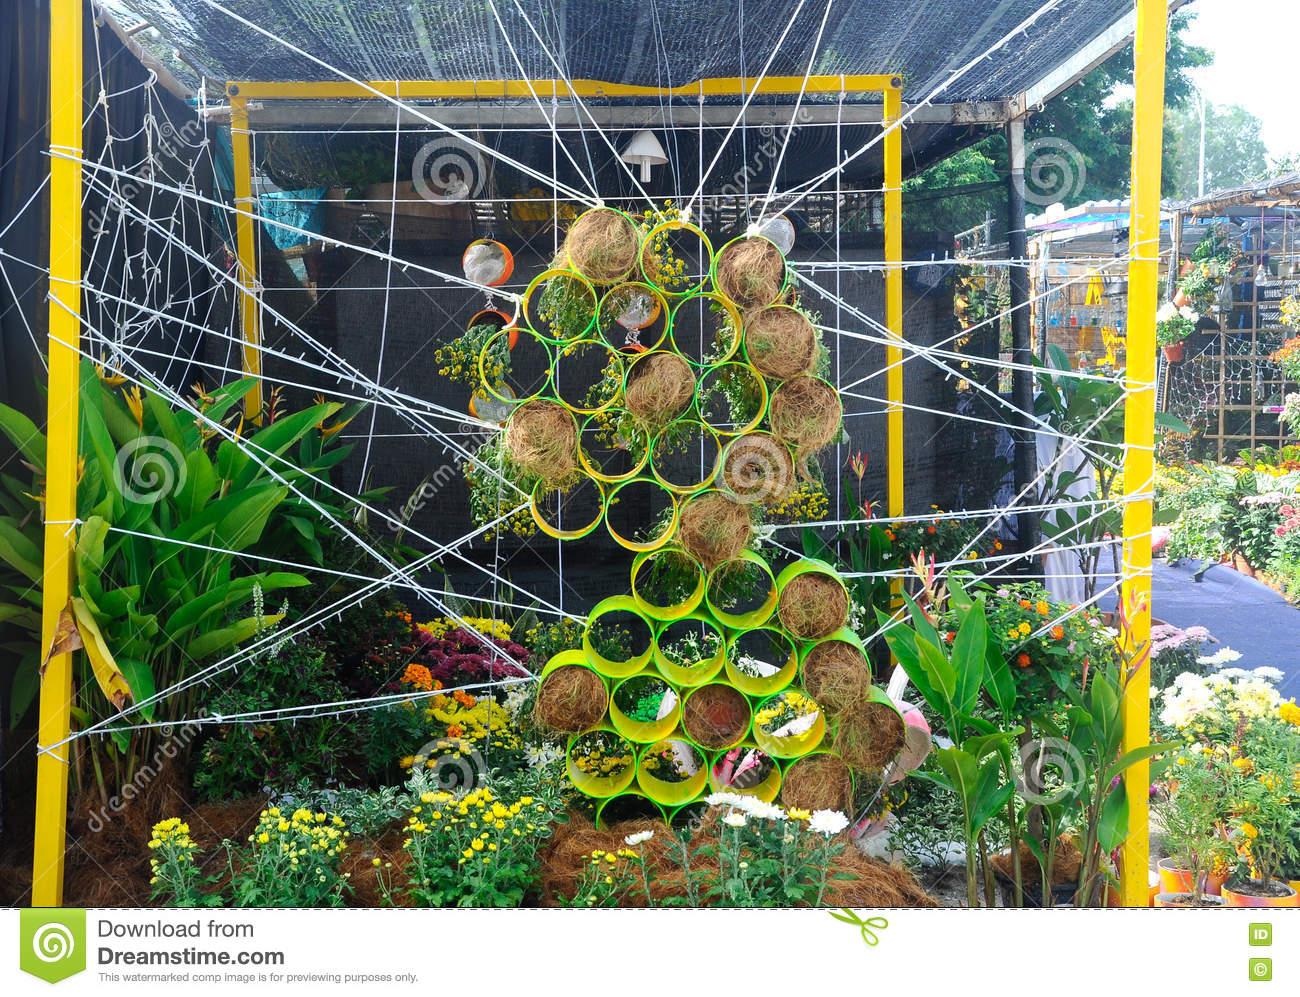 Full Size of Vertical Indoor Led Pdf Images Diy Vertikal Adalah Garten Balkon Pots Systems Kit Vegetables Innen Amazon Tower Vegetable Plants Pflanzen Von Blumen Und Gemse Garten Vertikal Garten